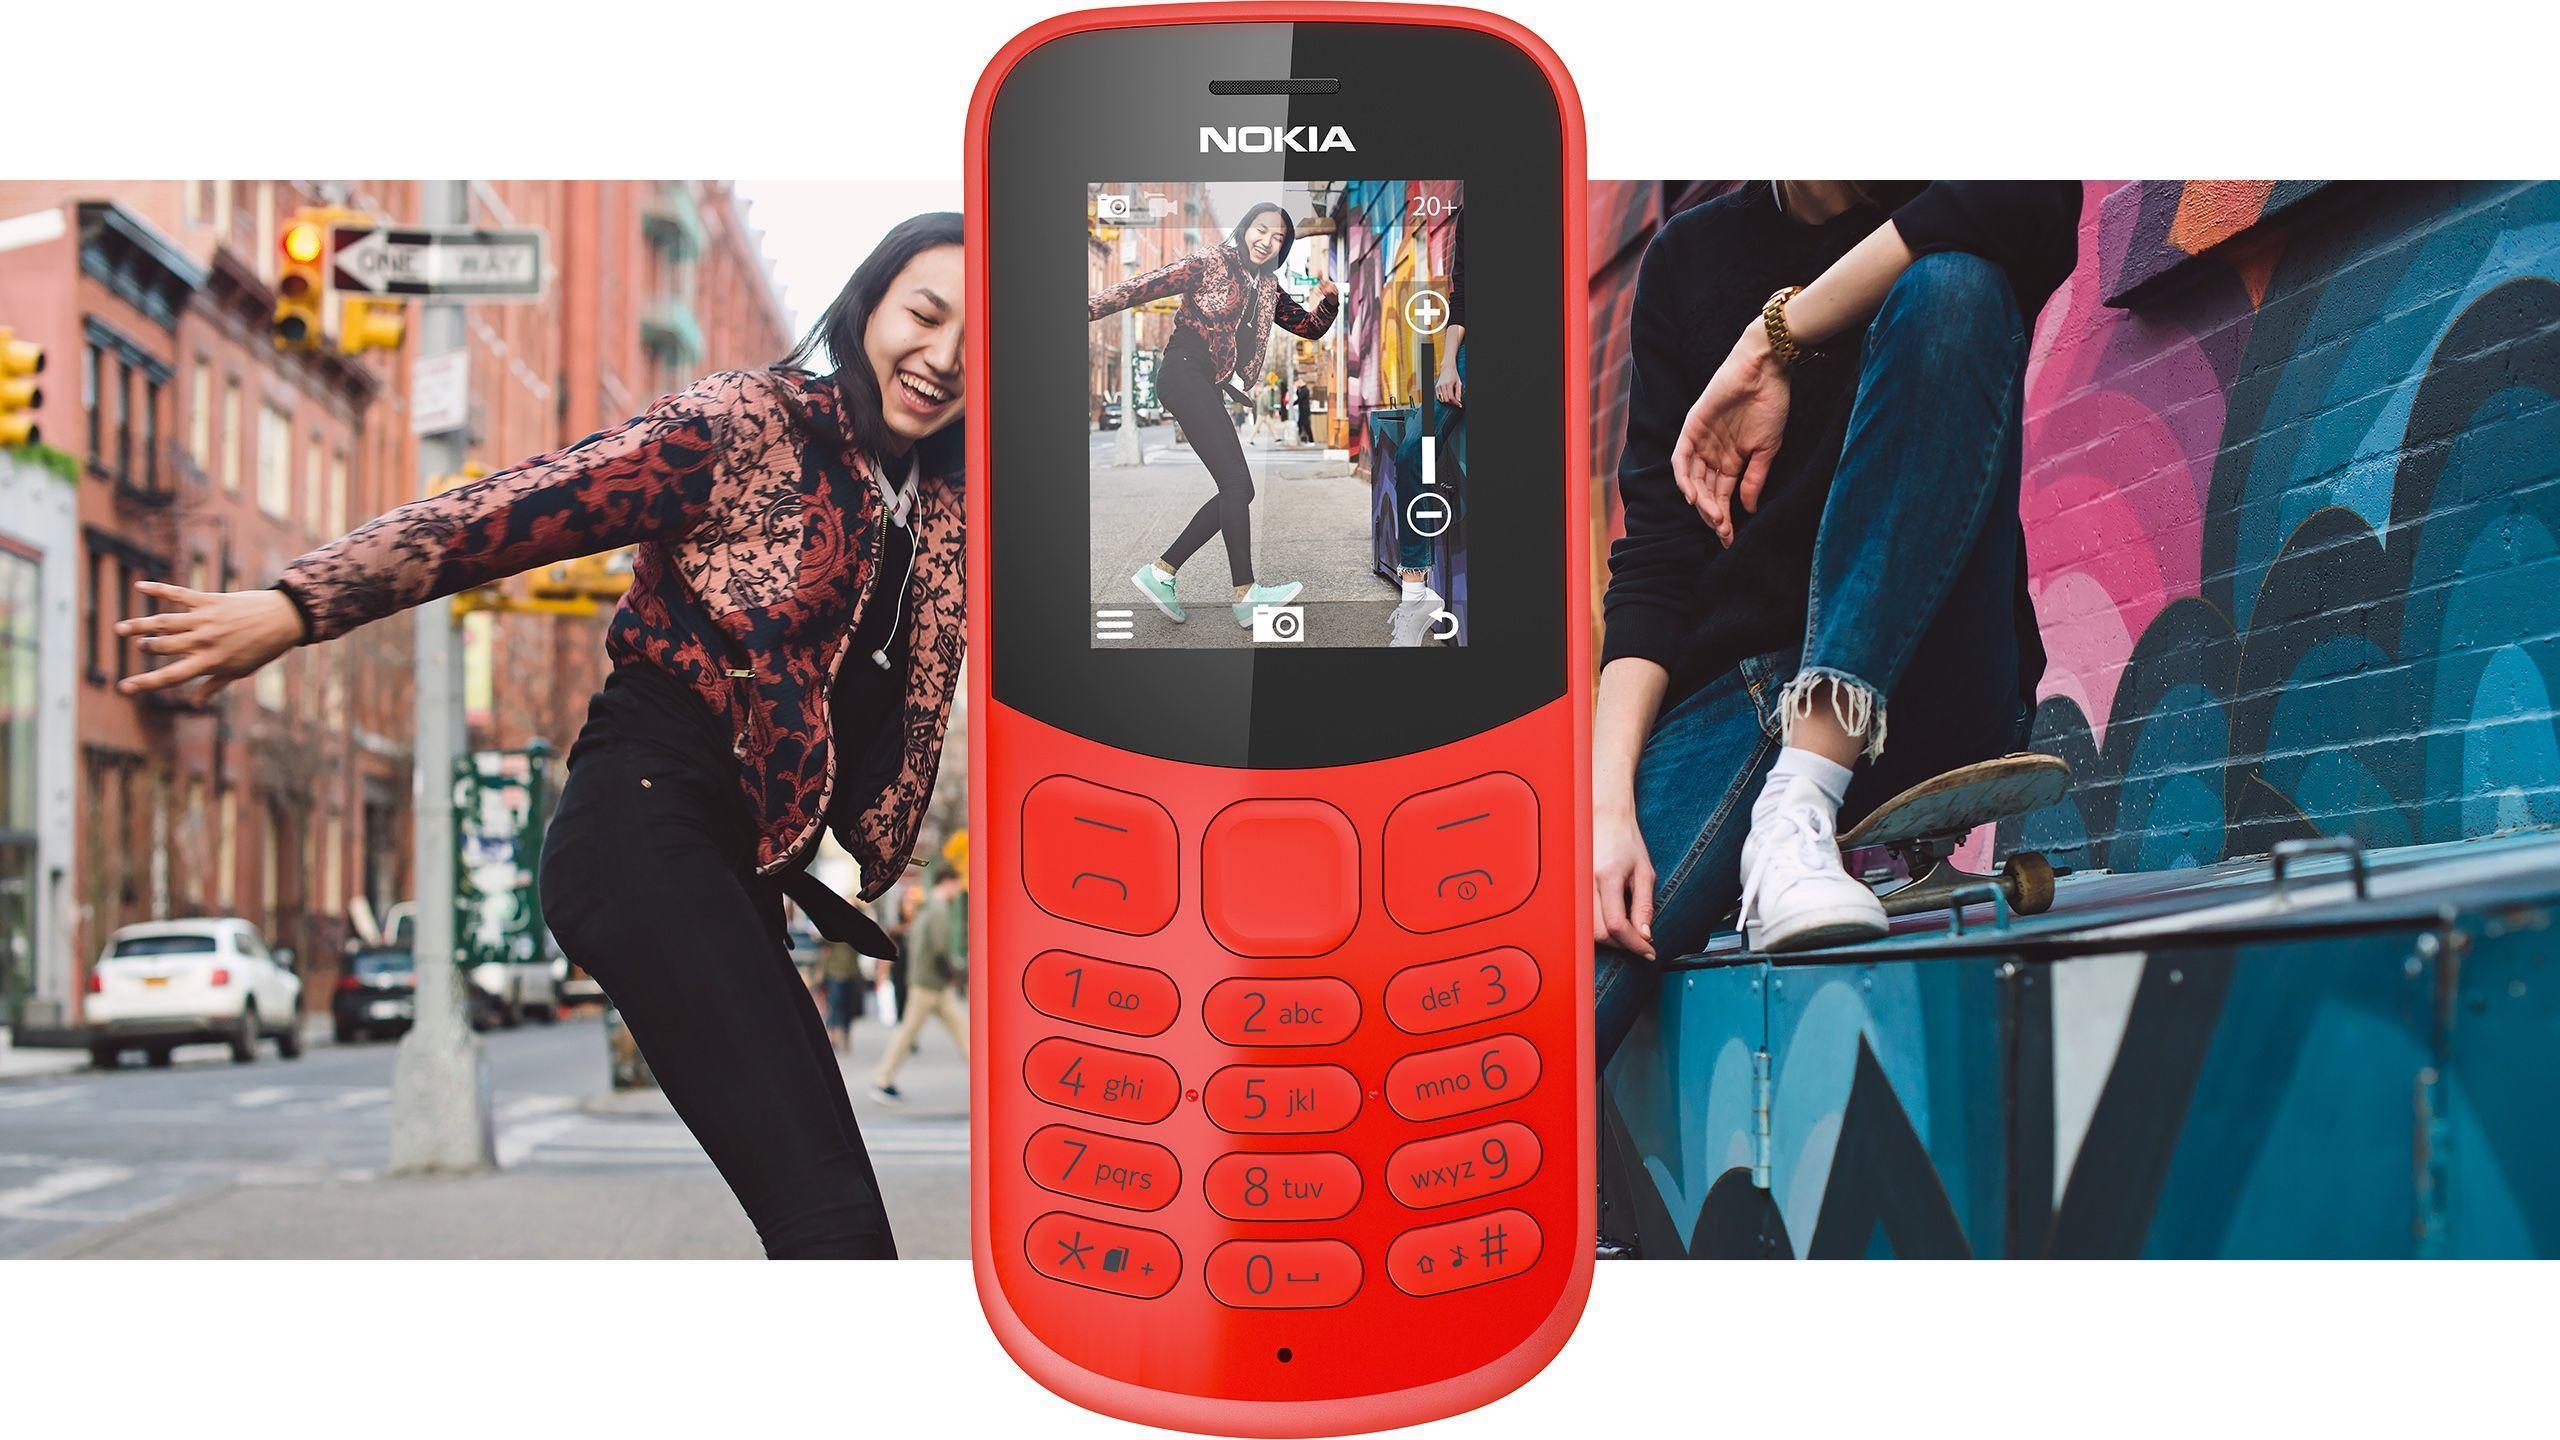 nokia130-camera-2560x1440.jpg